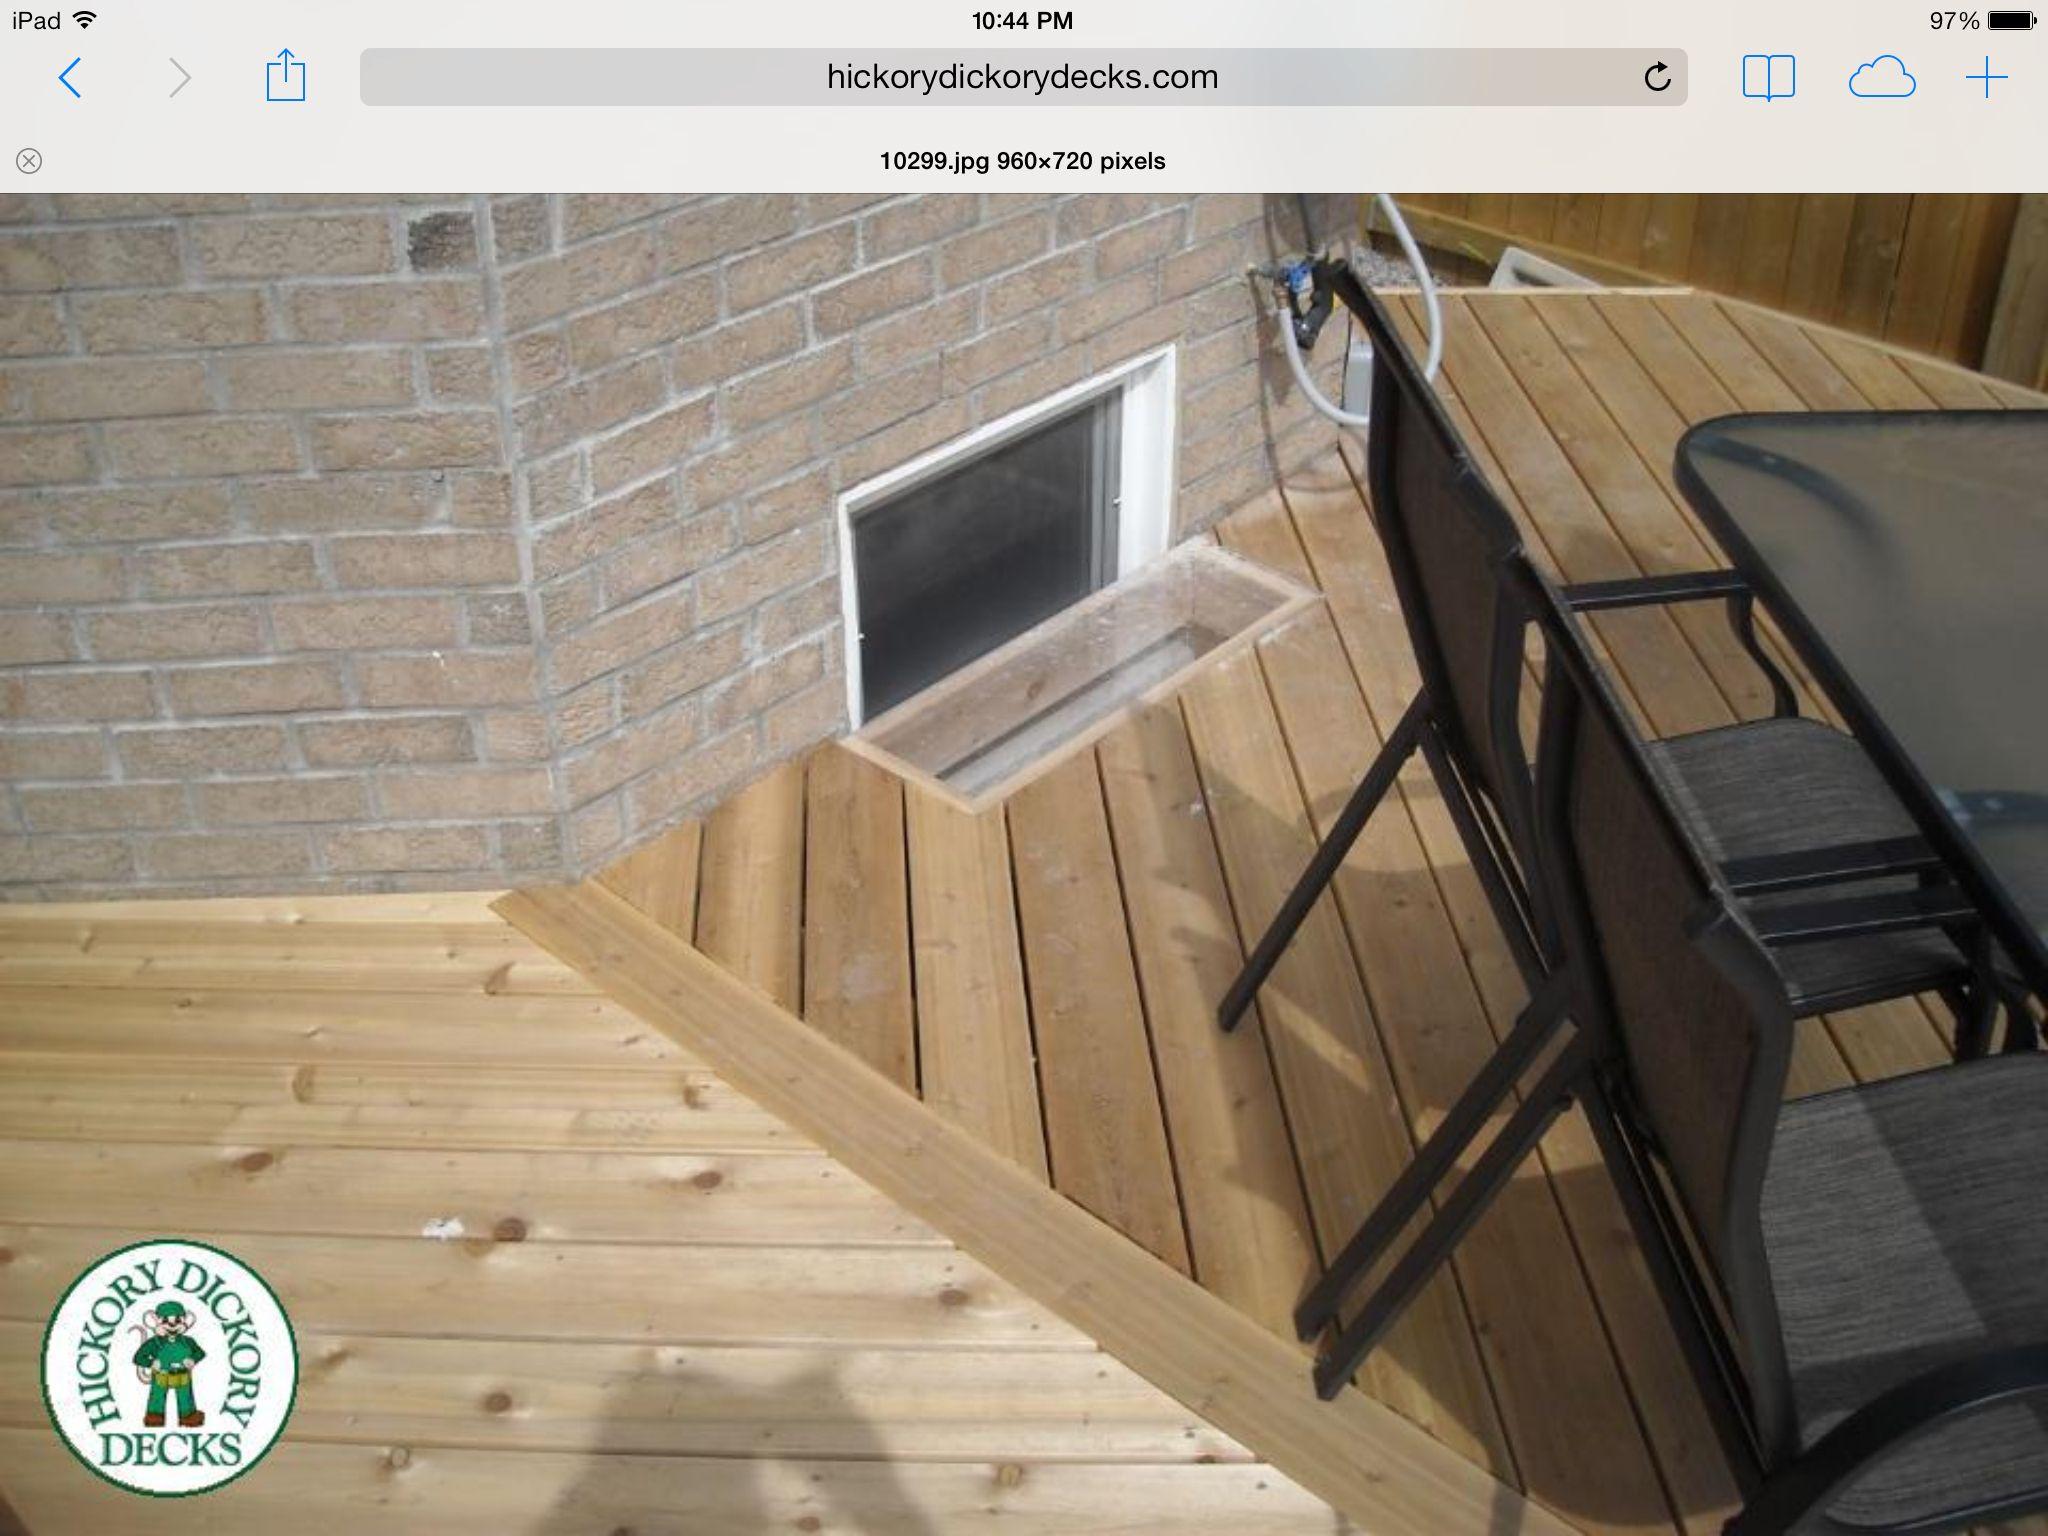 Plexi glass insert over basement window to let light through